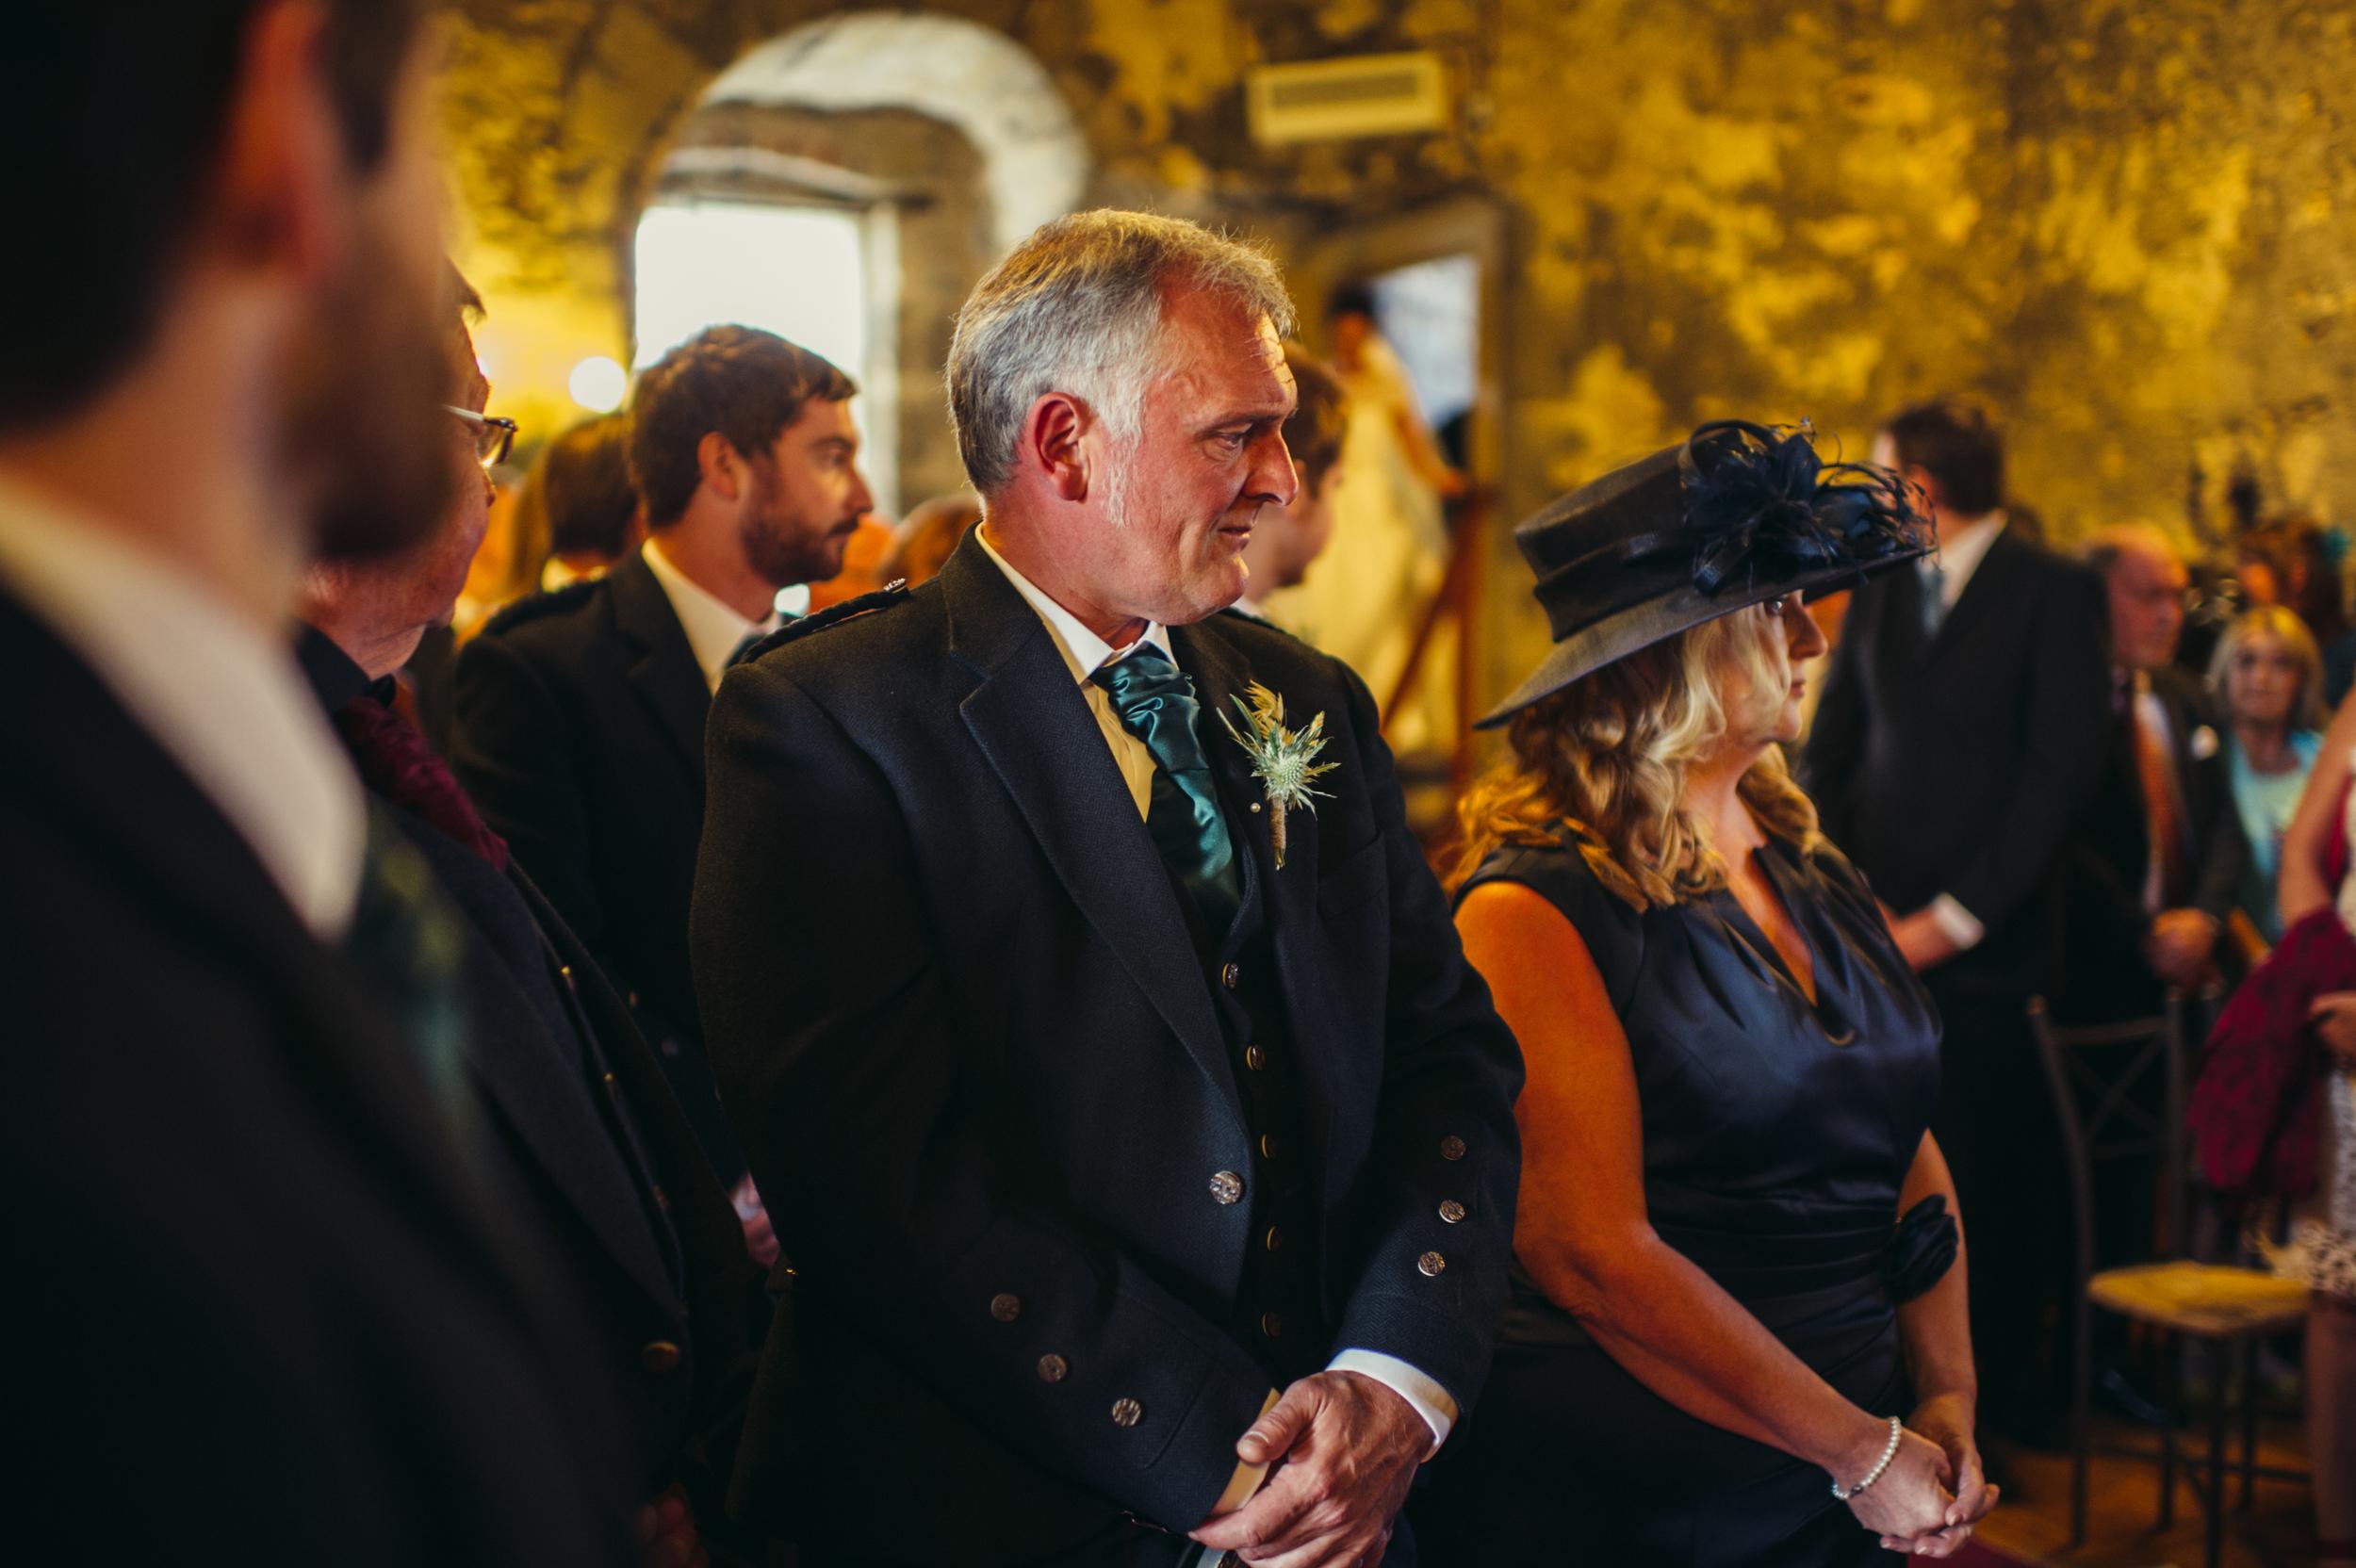 0095-lisa-devine-alternative-creative-wedding-photography-glasgow-edinburgh.JPG